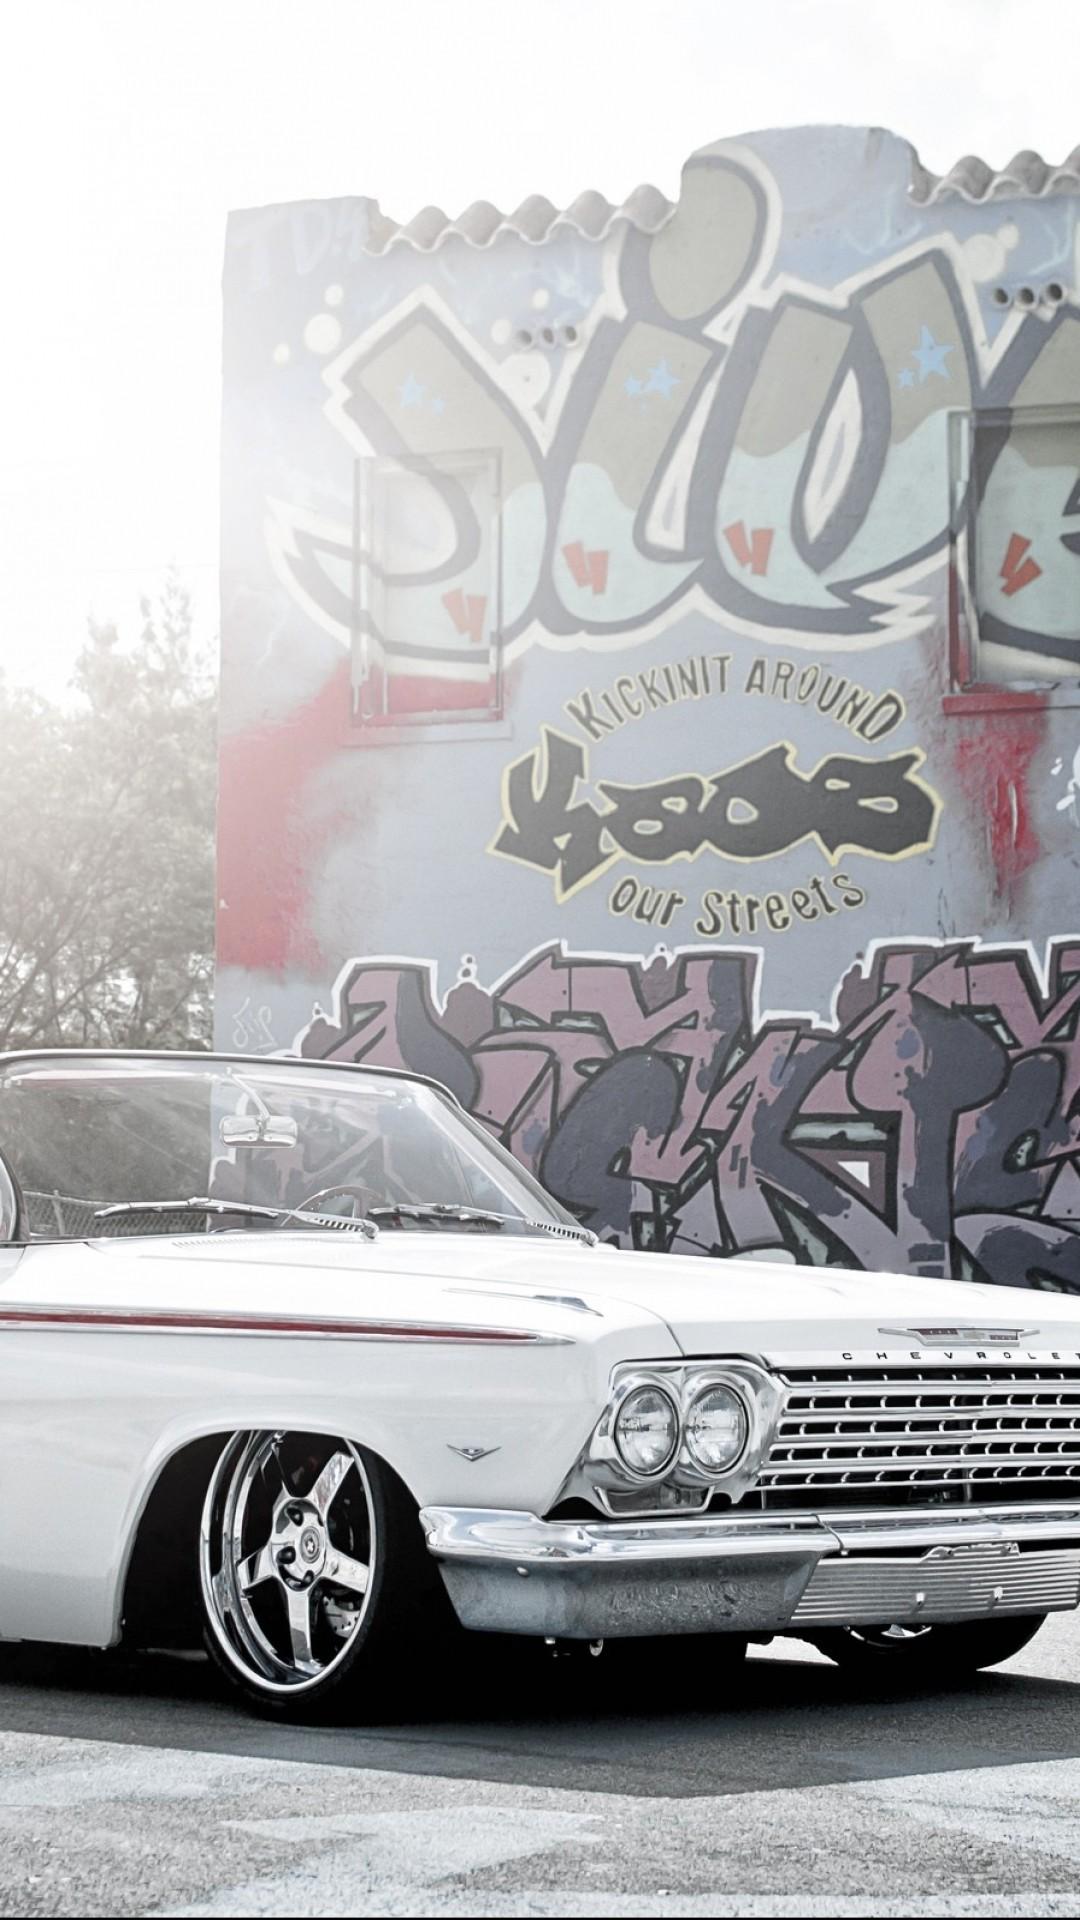 Car Wheel Hd Wallpaper Lowrider Car Wallpaper 183 ①